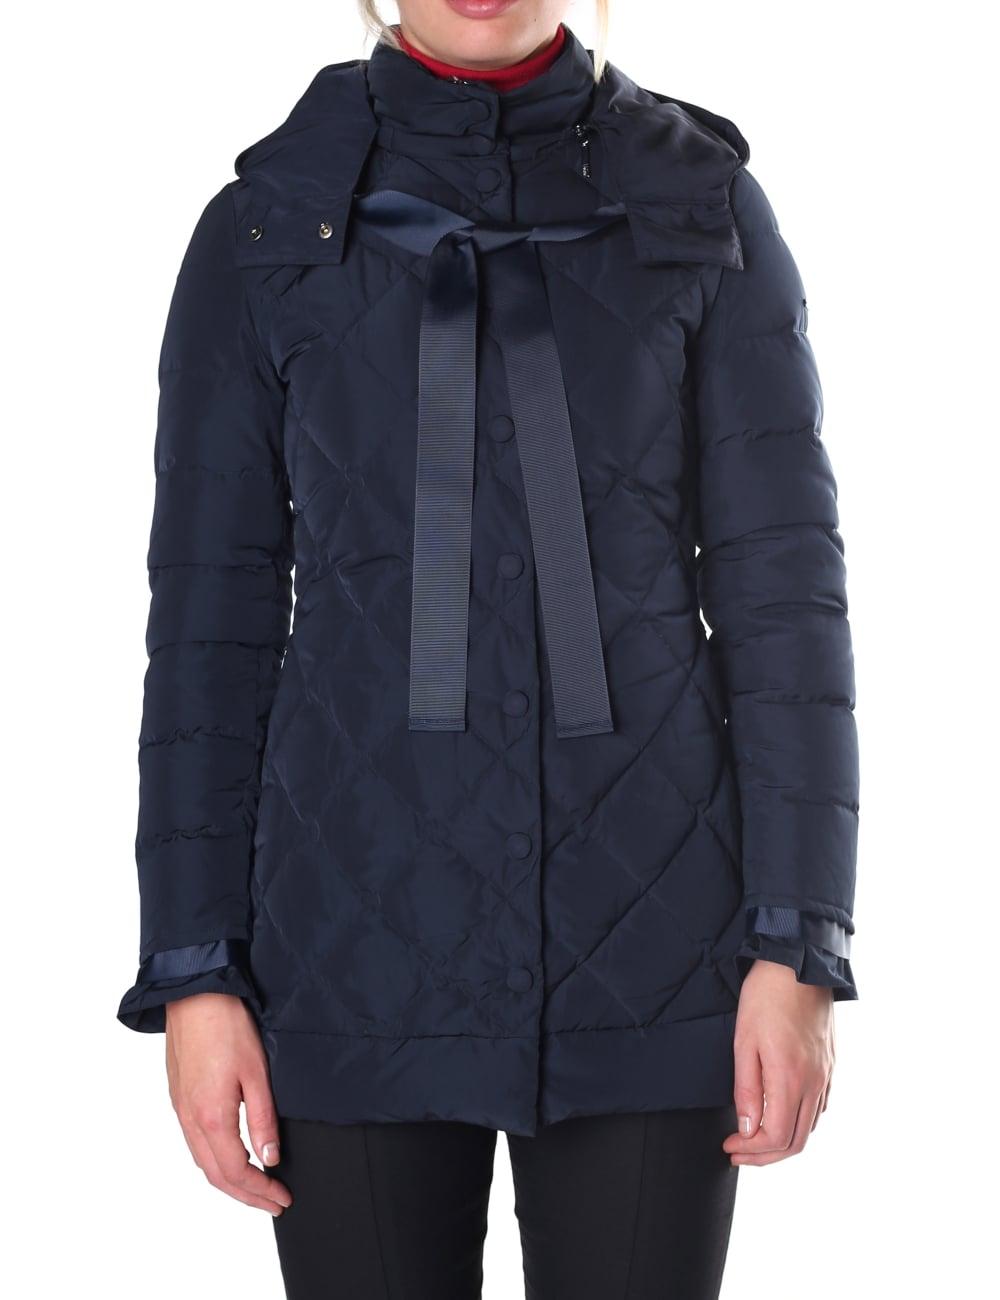 e51ed0894 Armani Jeans Bow Neck Women's Coat